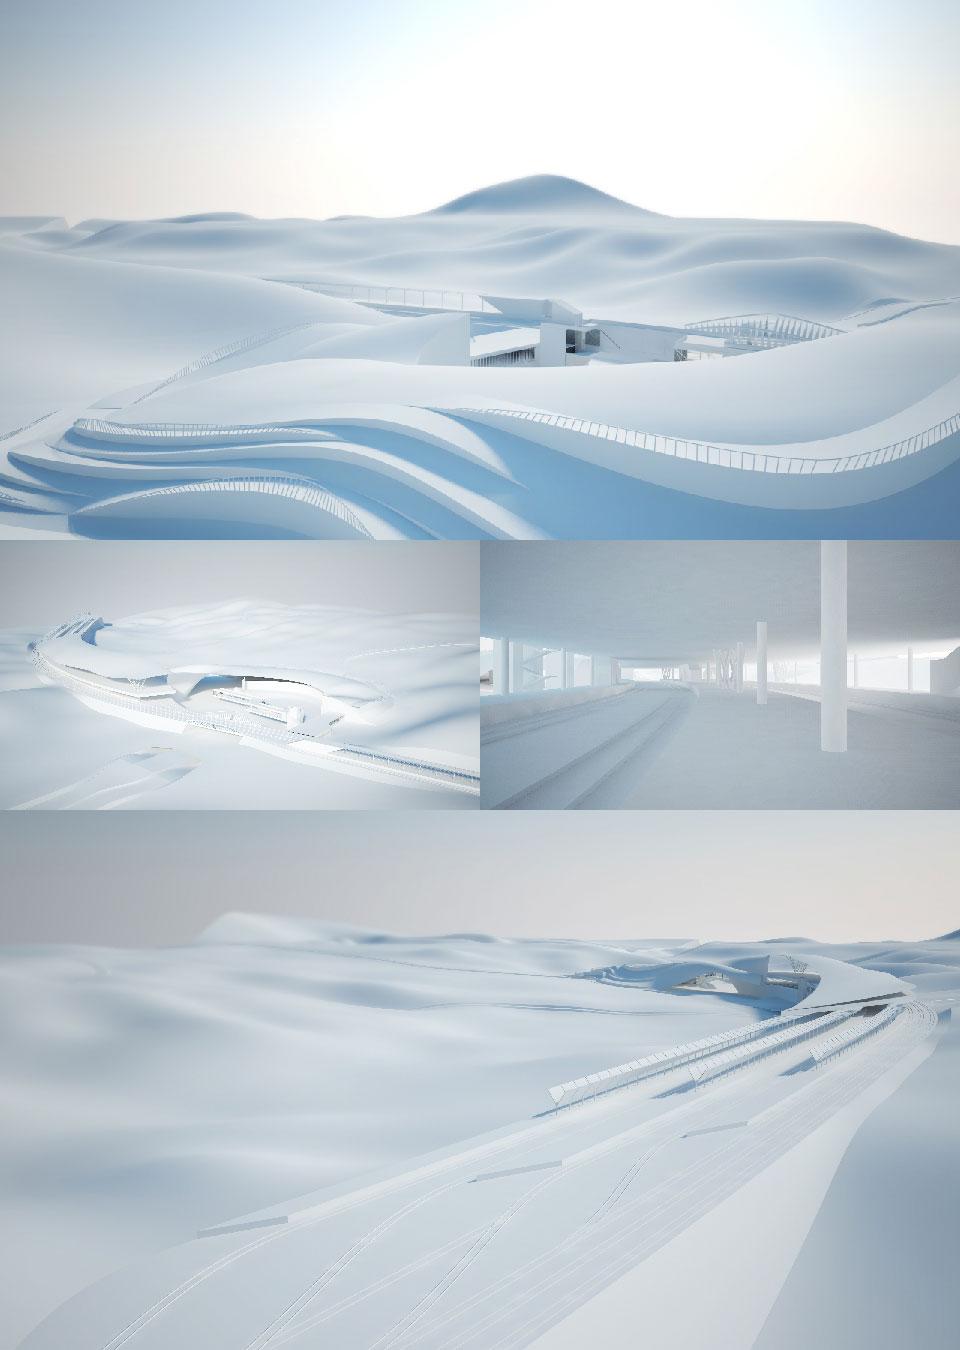 transport hub visualizations in white